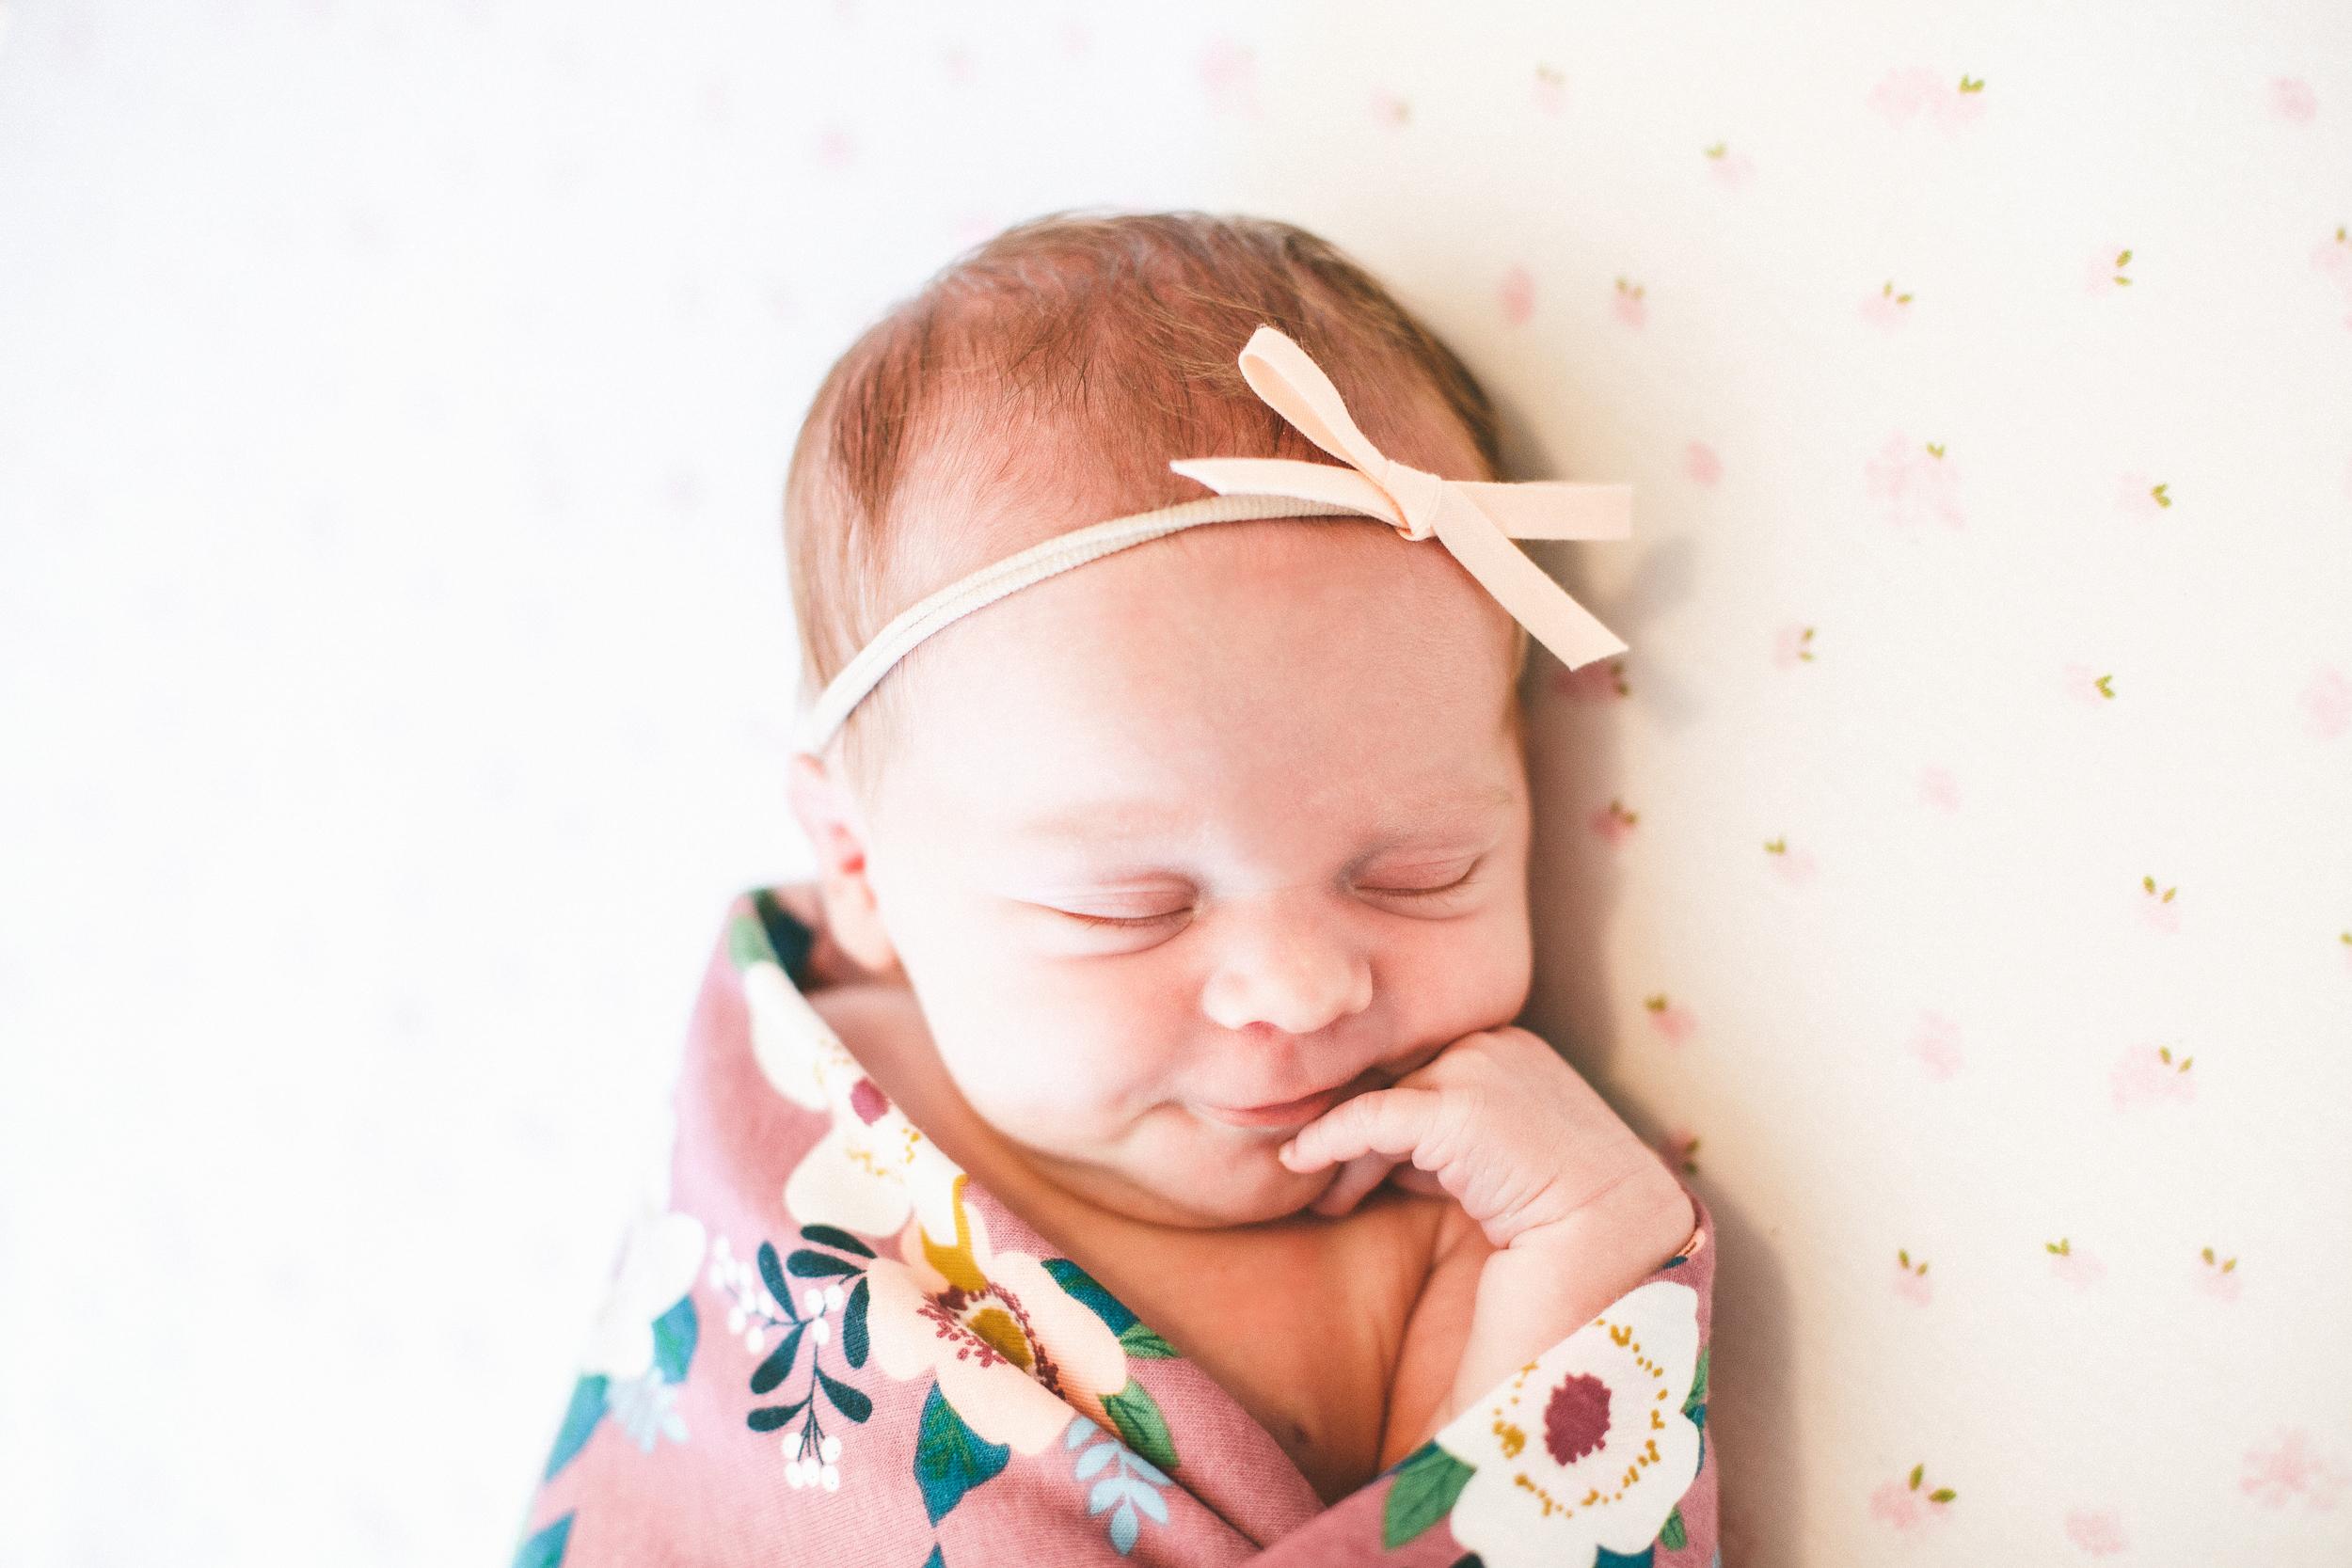 Rochester_NY_Lifestyle_Newborn_Photographer-17.jpg